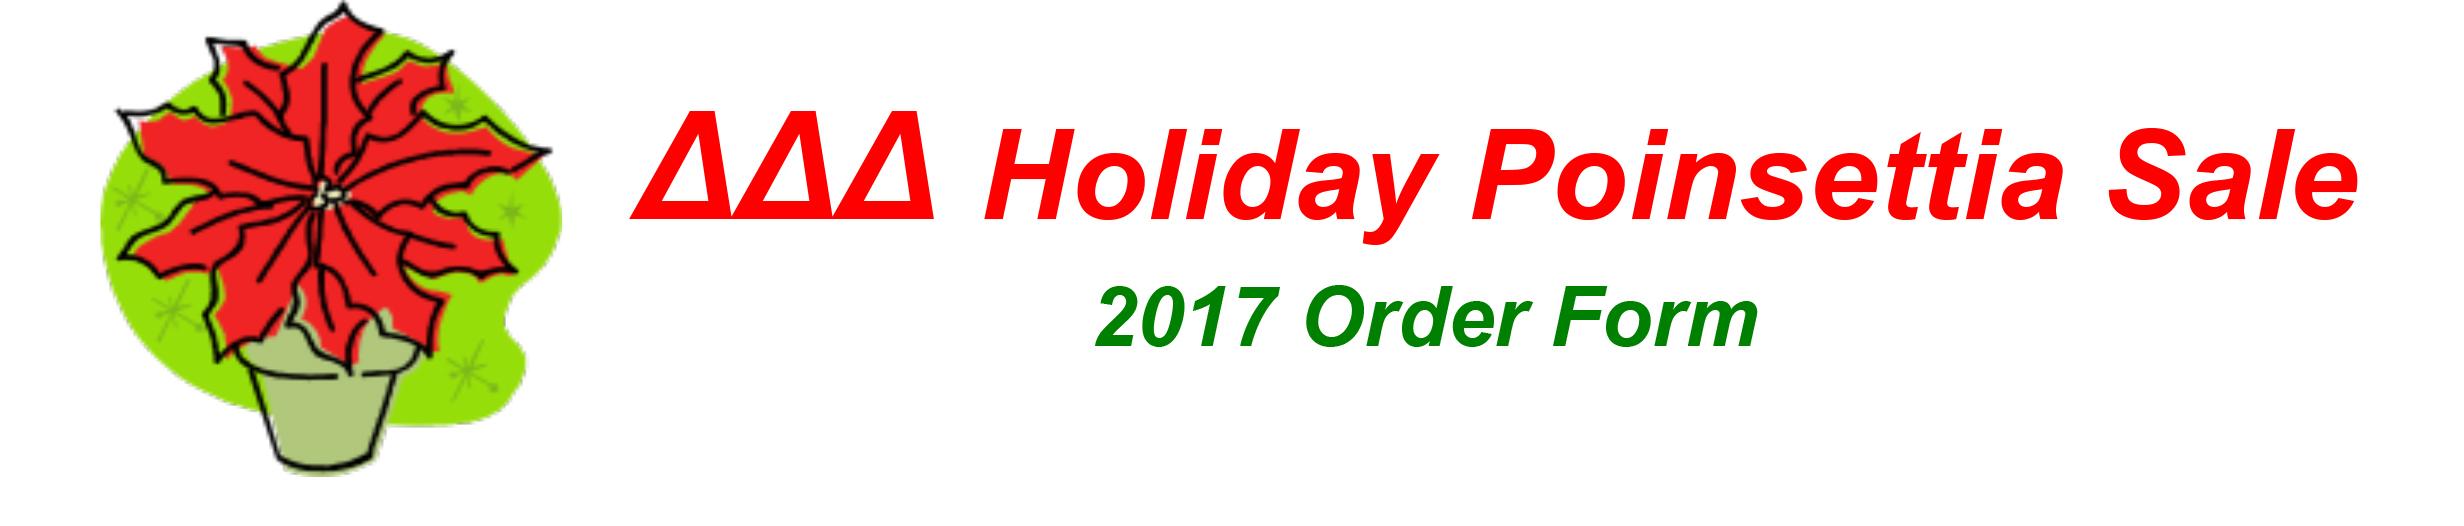 Microsoft Word - DDD Holiday Poinsettia Sale 2017.docx